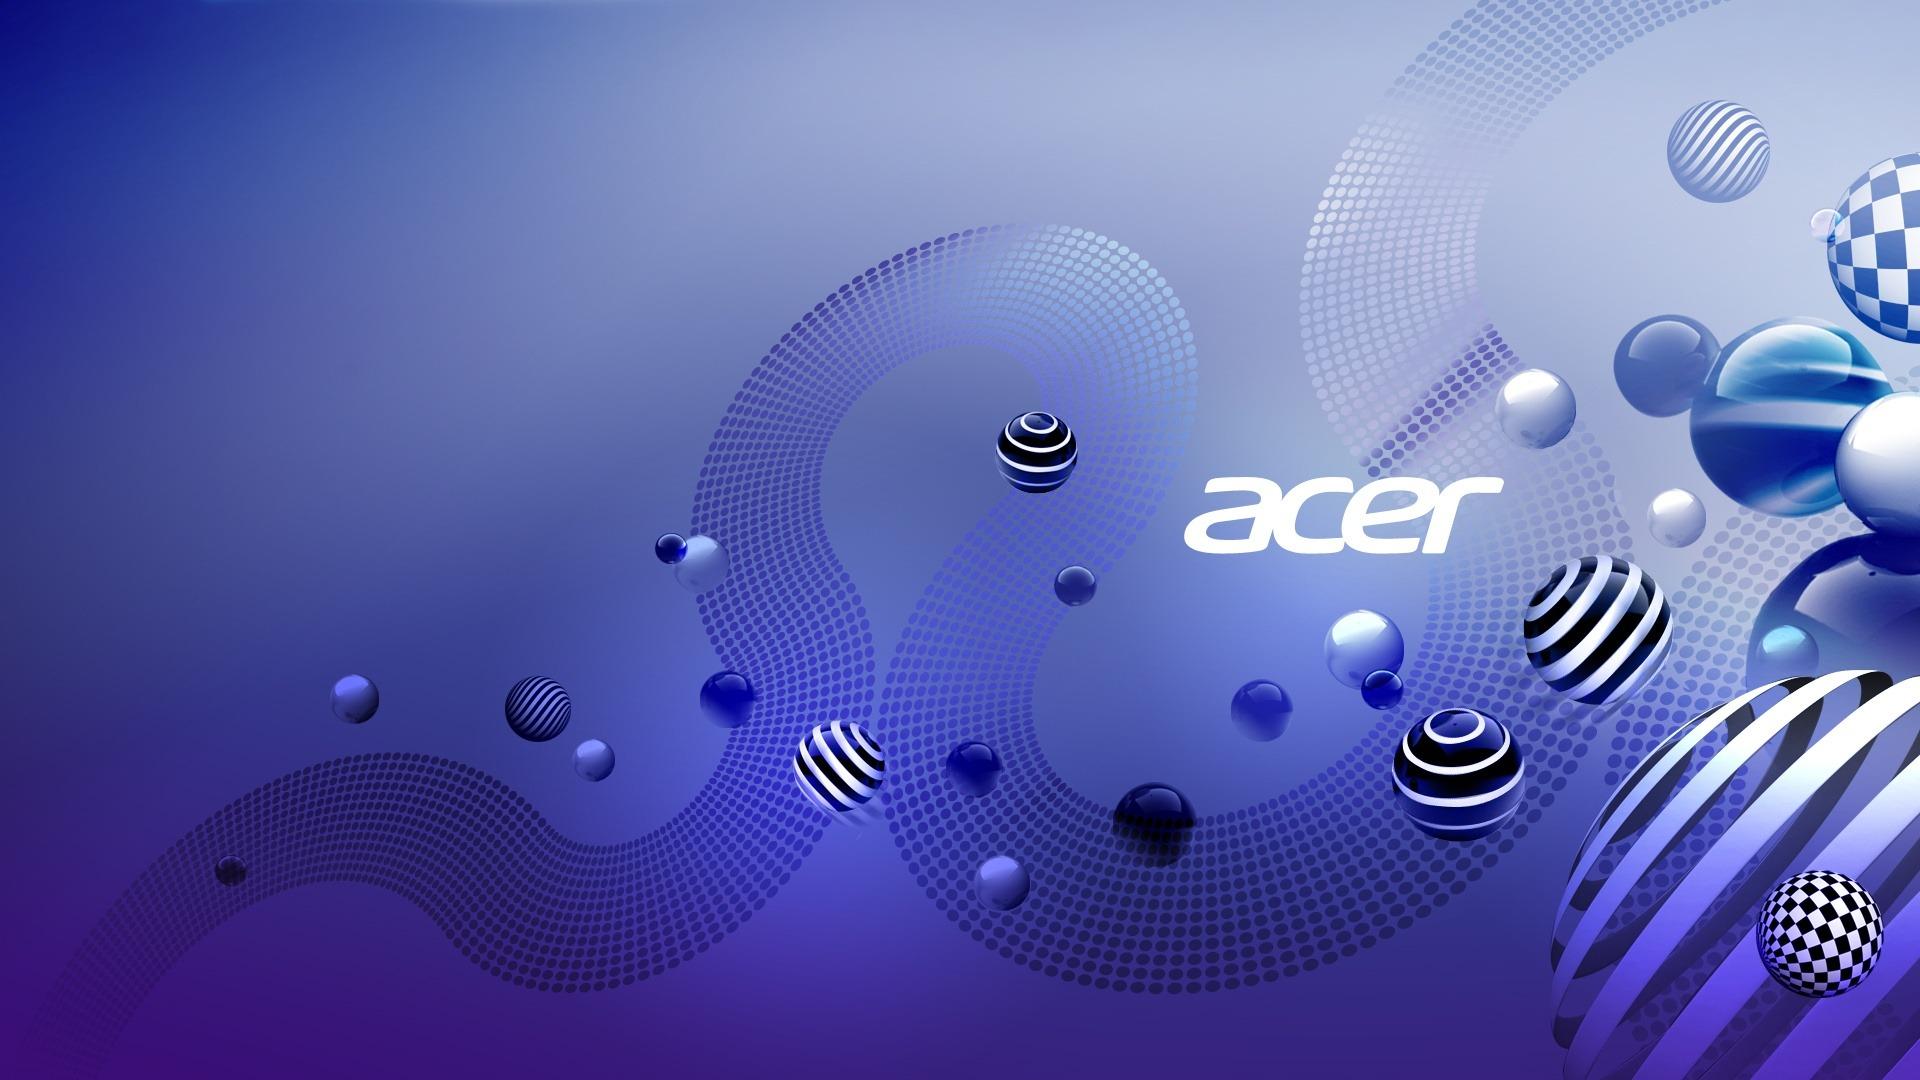 Fondo De Pantalla De Acer Púrpura Digital Hd Avance